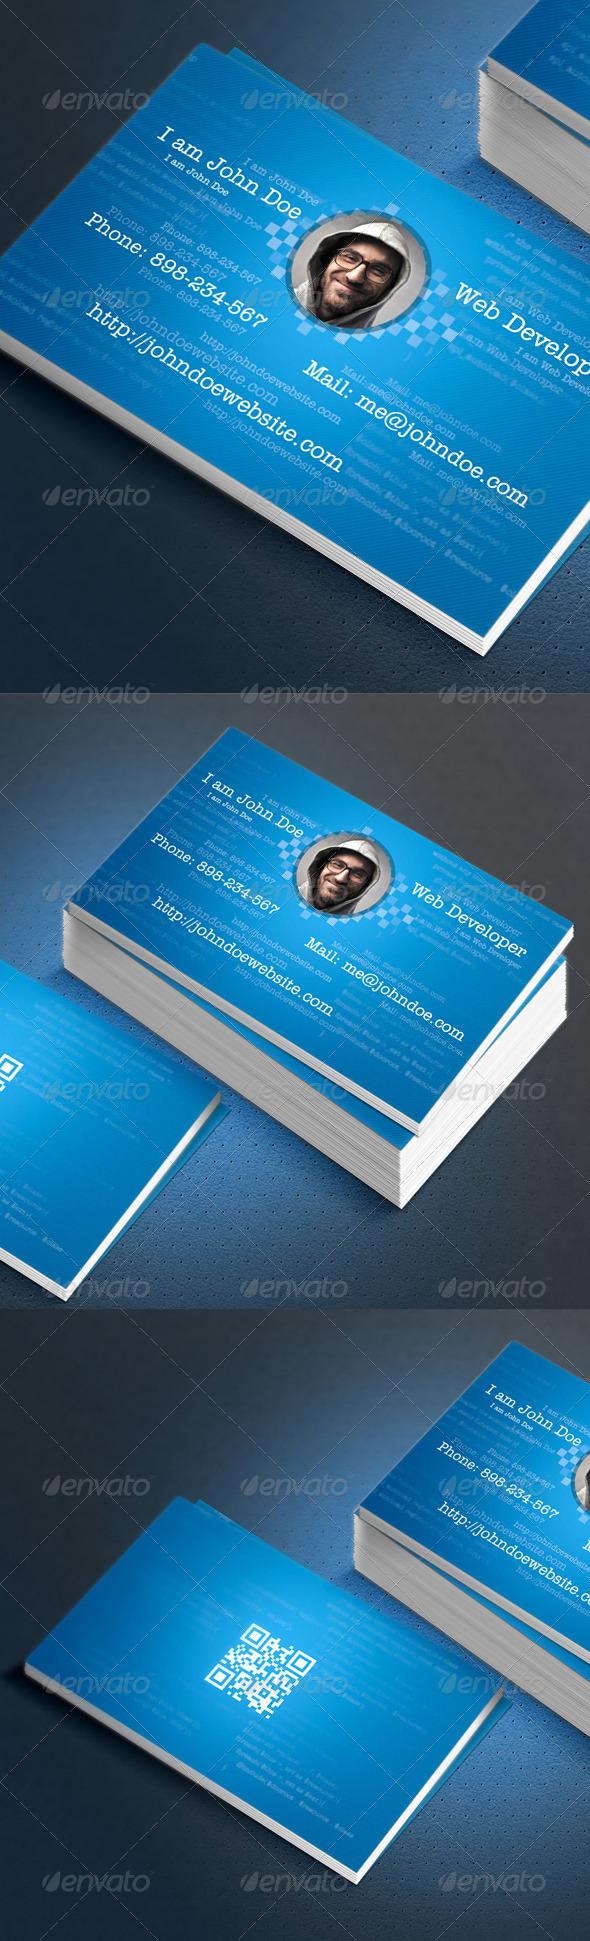 Web Developer Coder FreelancerBusiness Card Design - Industry Specific Business Cards